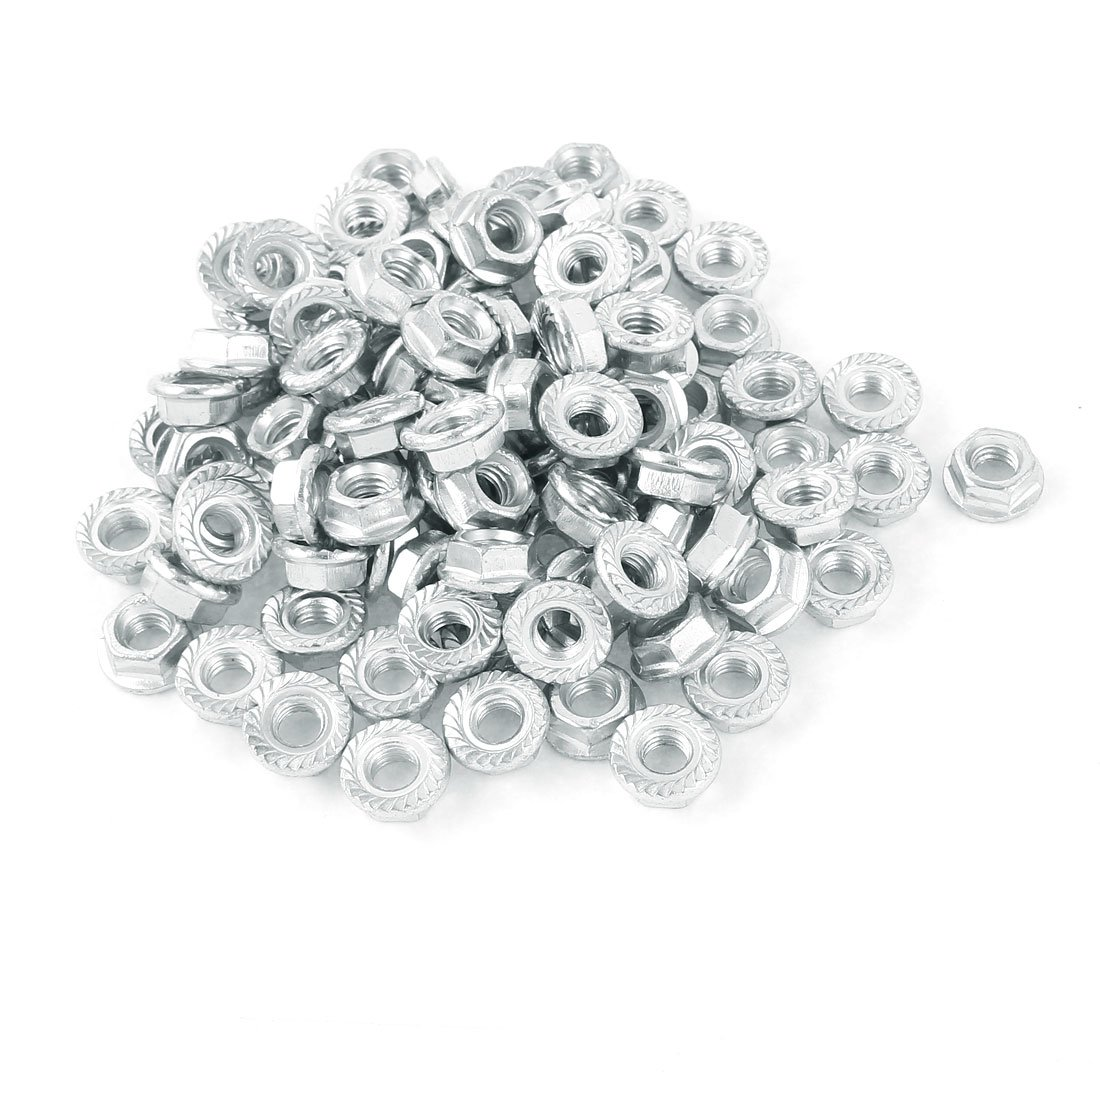 uxcell M6 Carbon Steel Zinc Plated Serrated Flange Hex Machine Screw Lock Nuts 100pcs